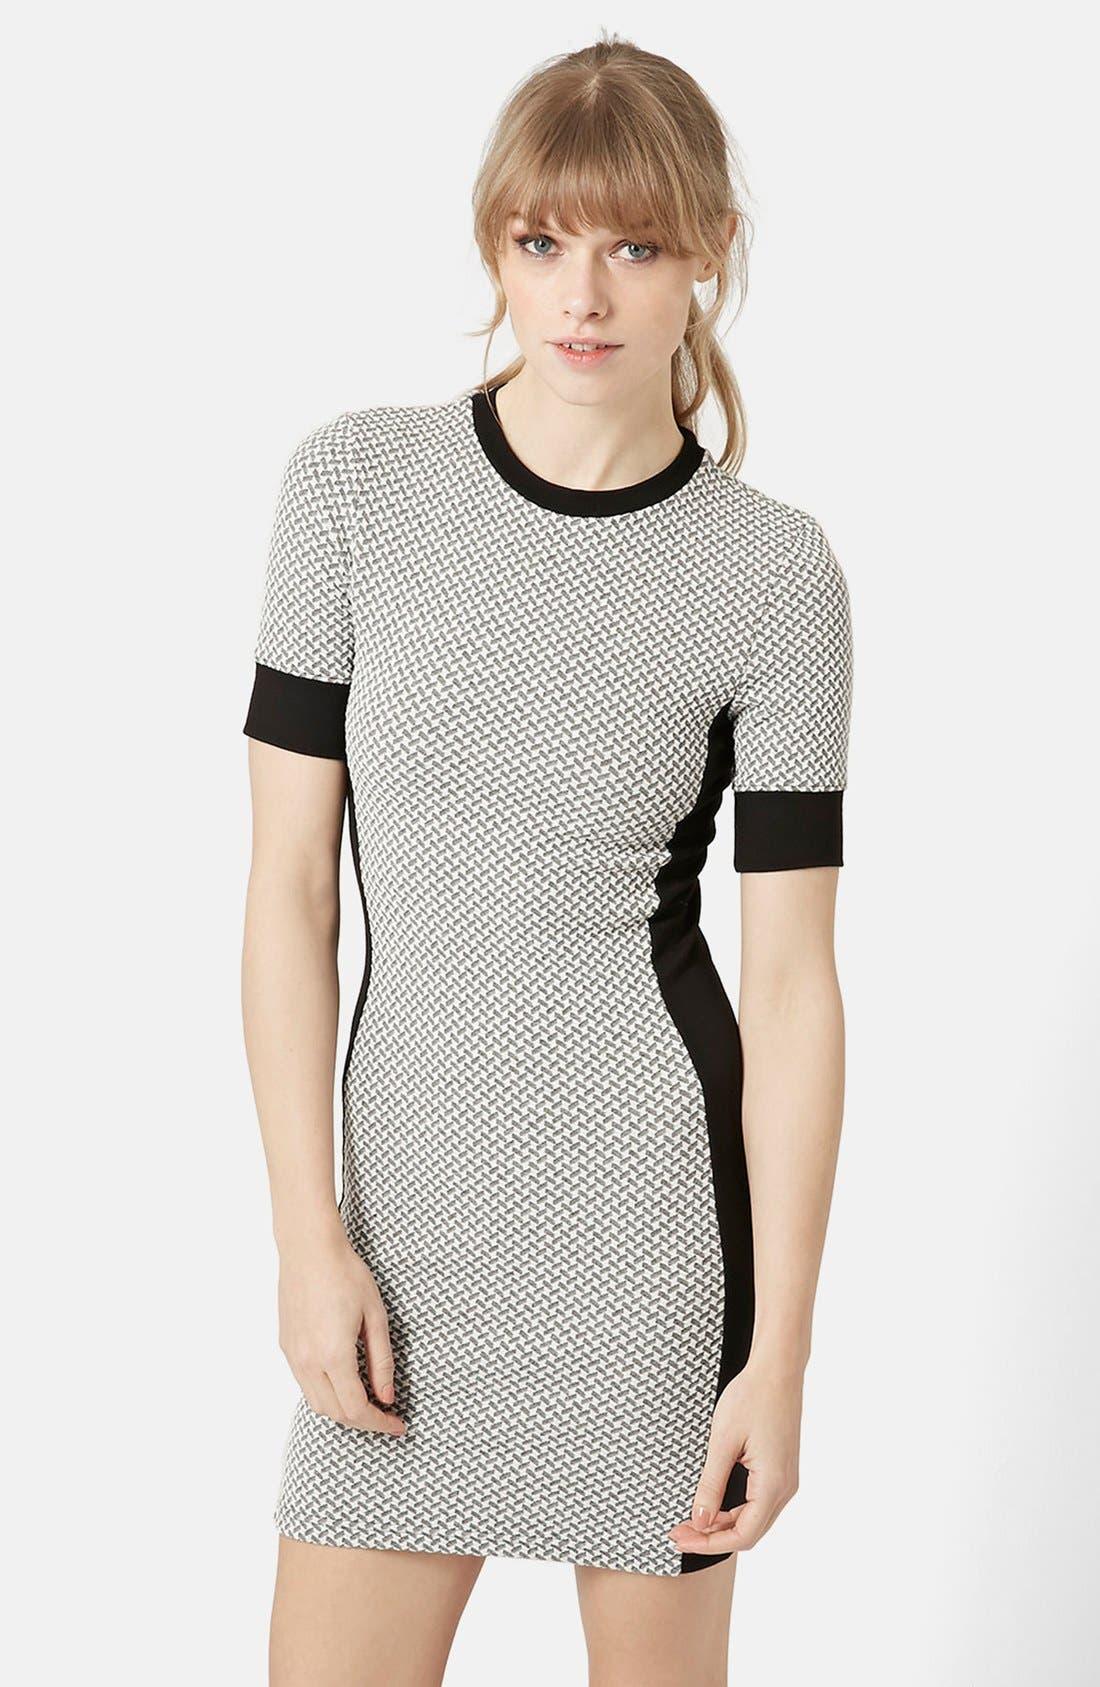 Alternate Image 1 Selected - Topshop Geometric Print Body-Con Dress (Regular & Petite)